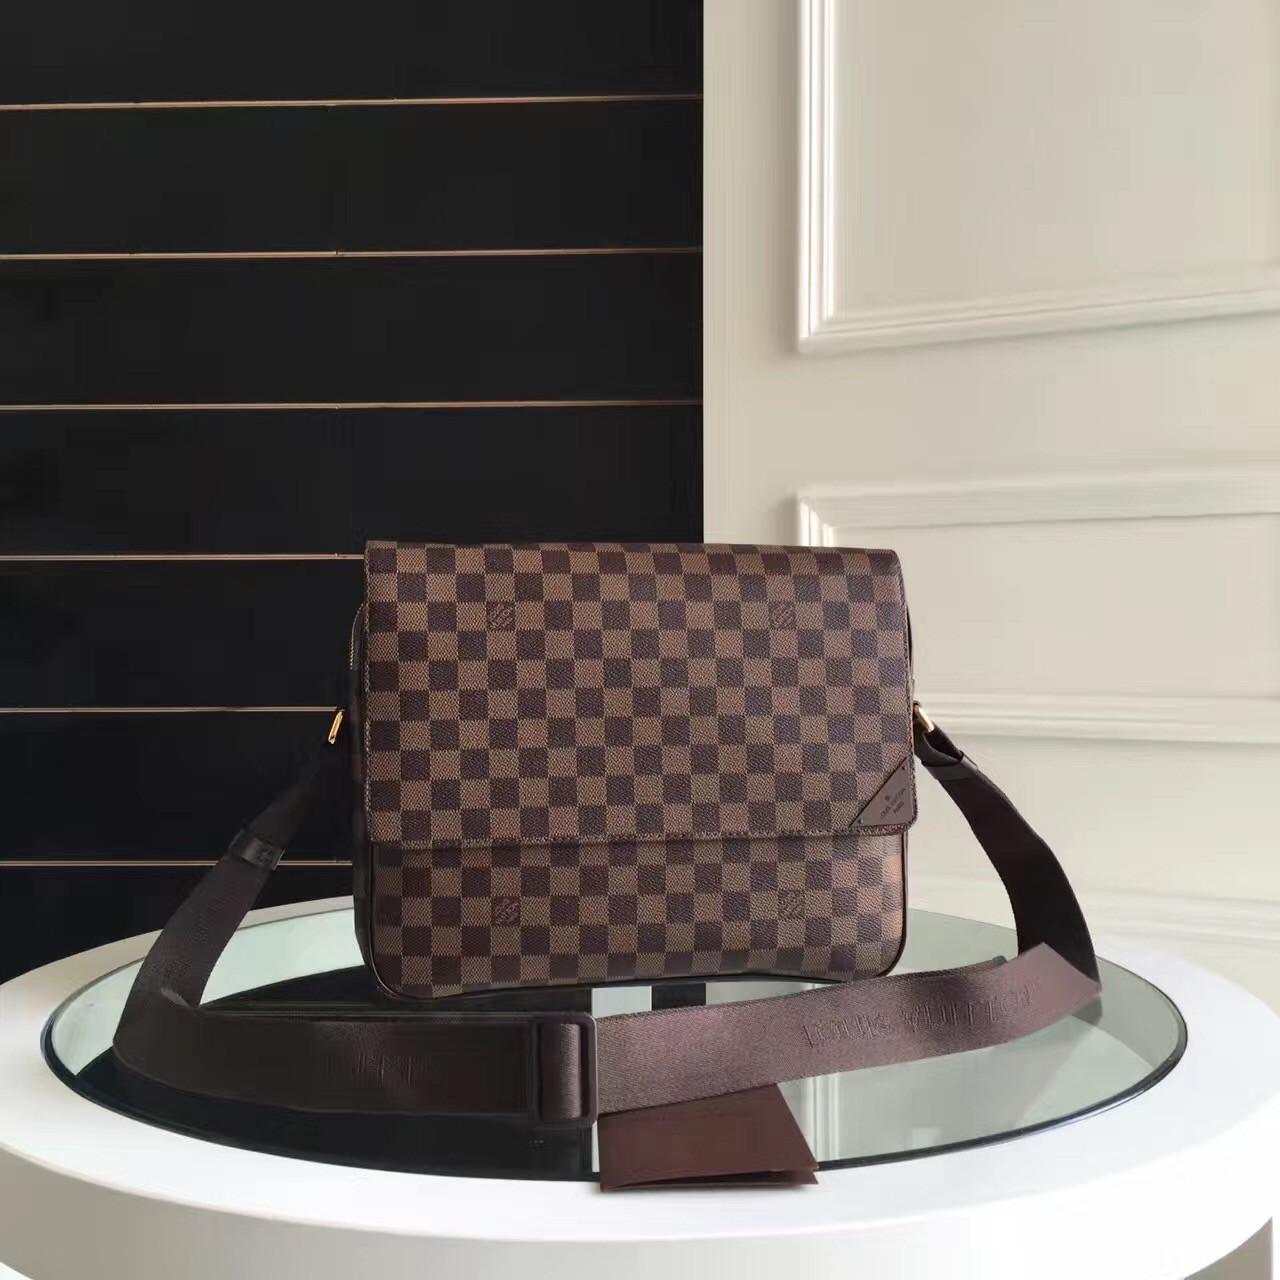 c706ec1b8f65 Мужская сумка мессенджер Louis Vuitton, Damier Ebene Canvas, цена 7 300  грн., купить в Киеве — Prom.ua (ID#535078237)